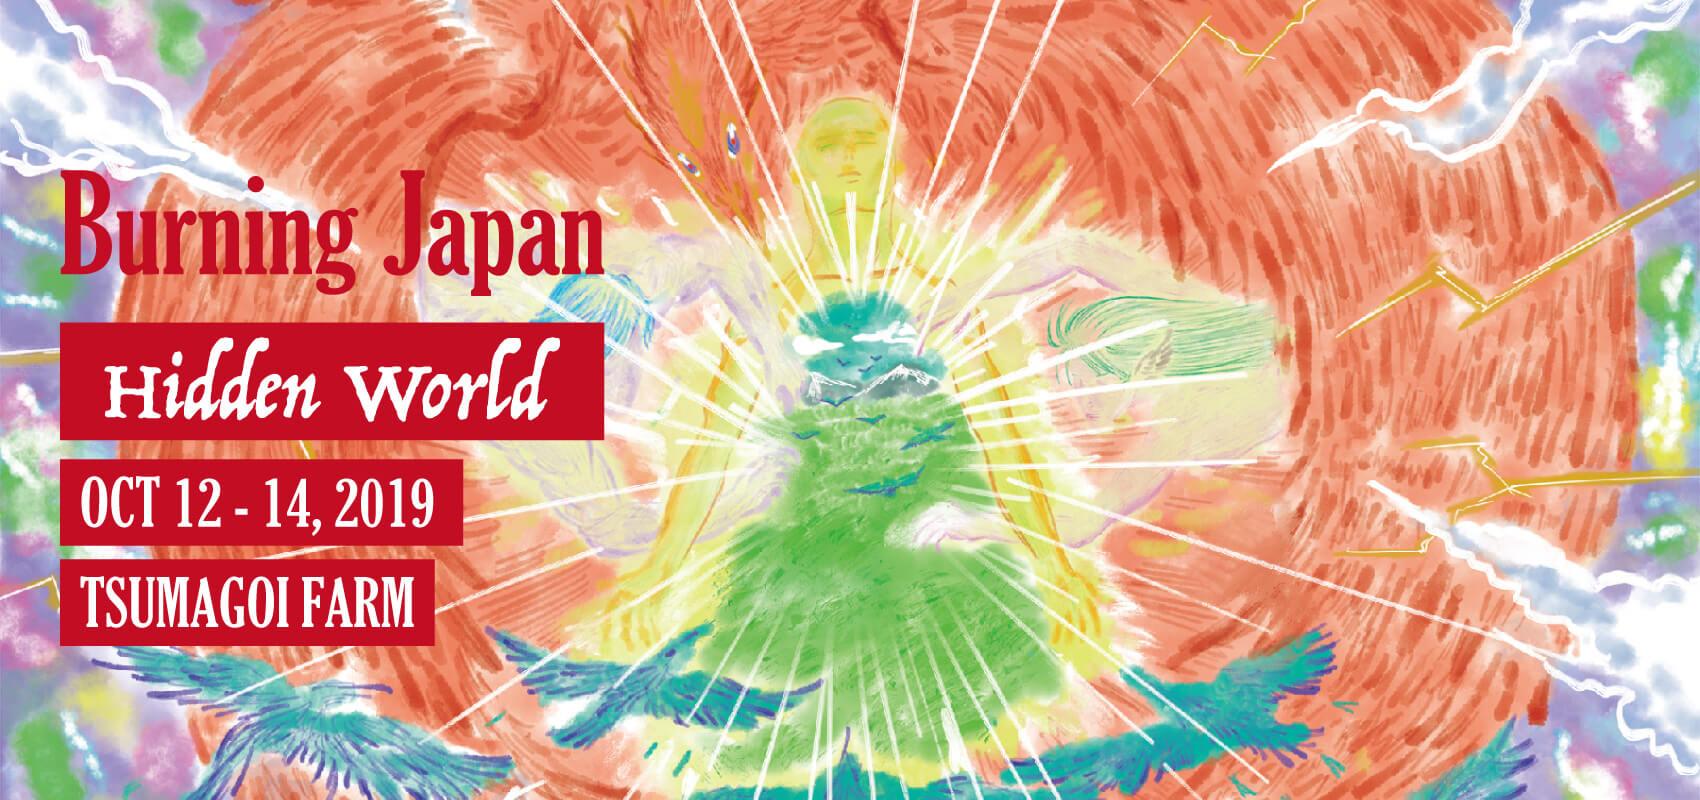 Burning Japan 2019